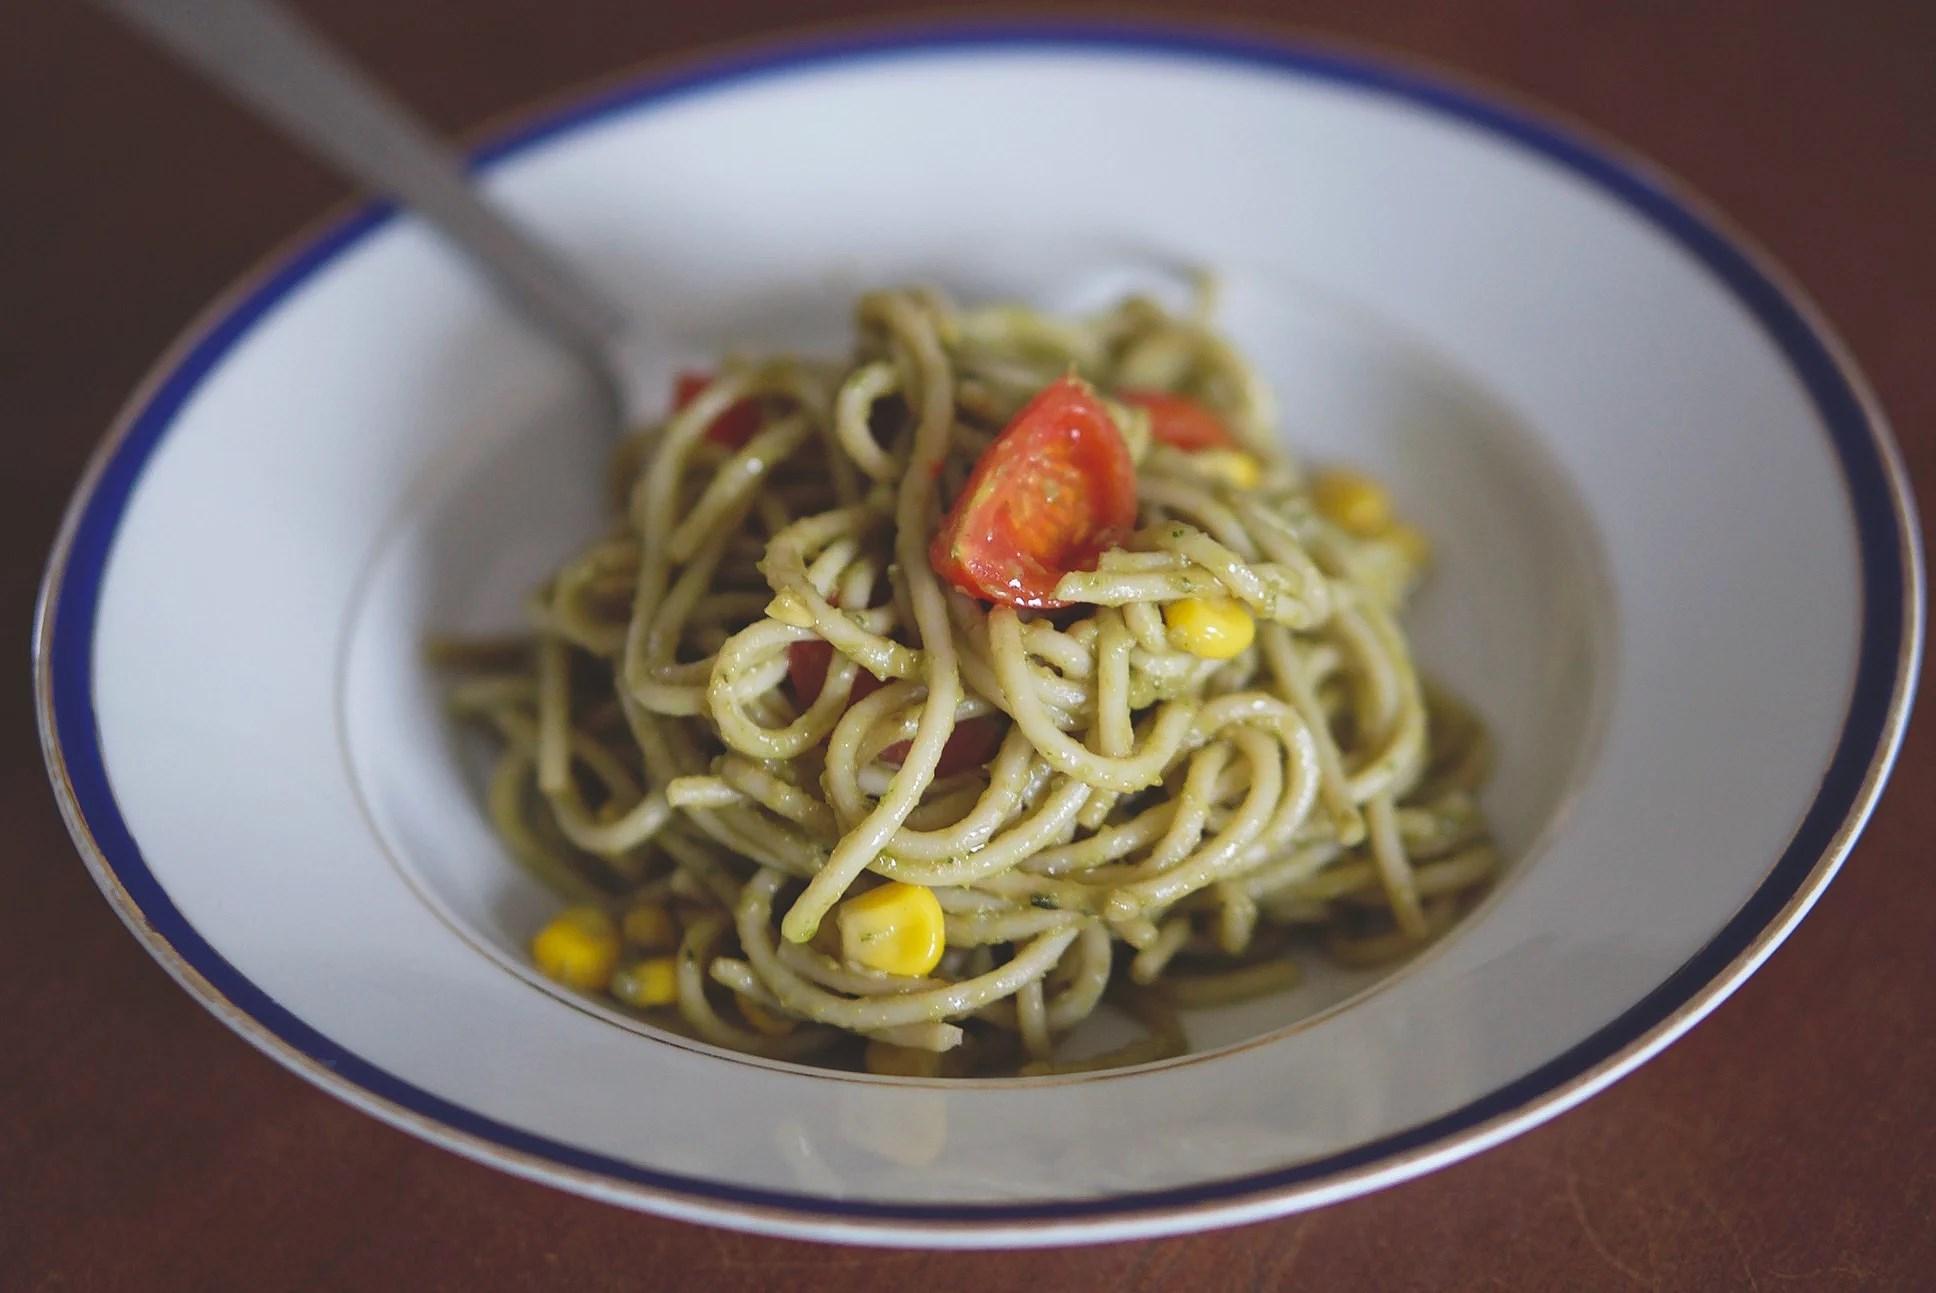 Creamy Avocado Pasta (Vegan)